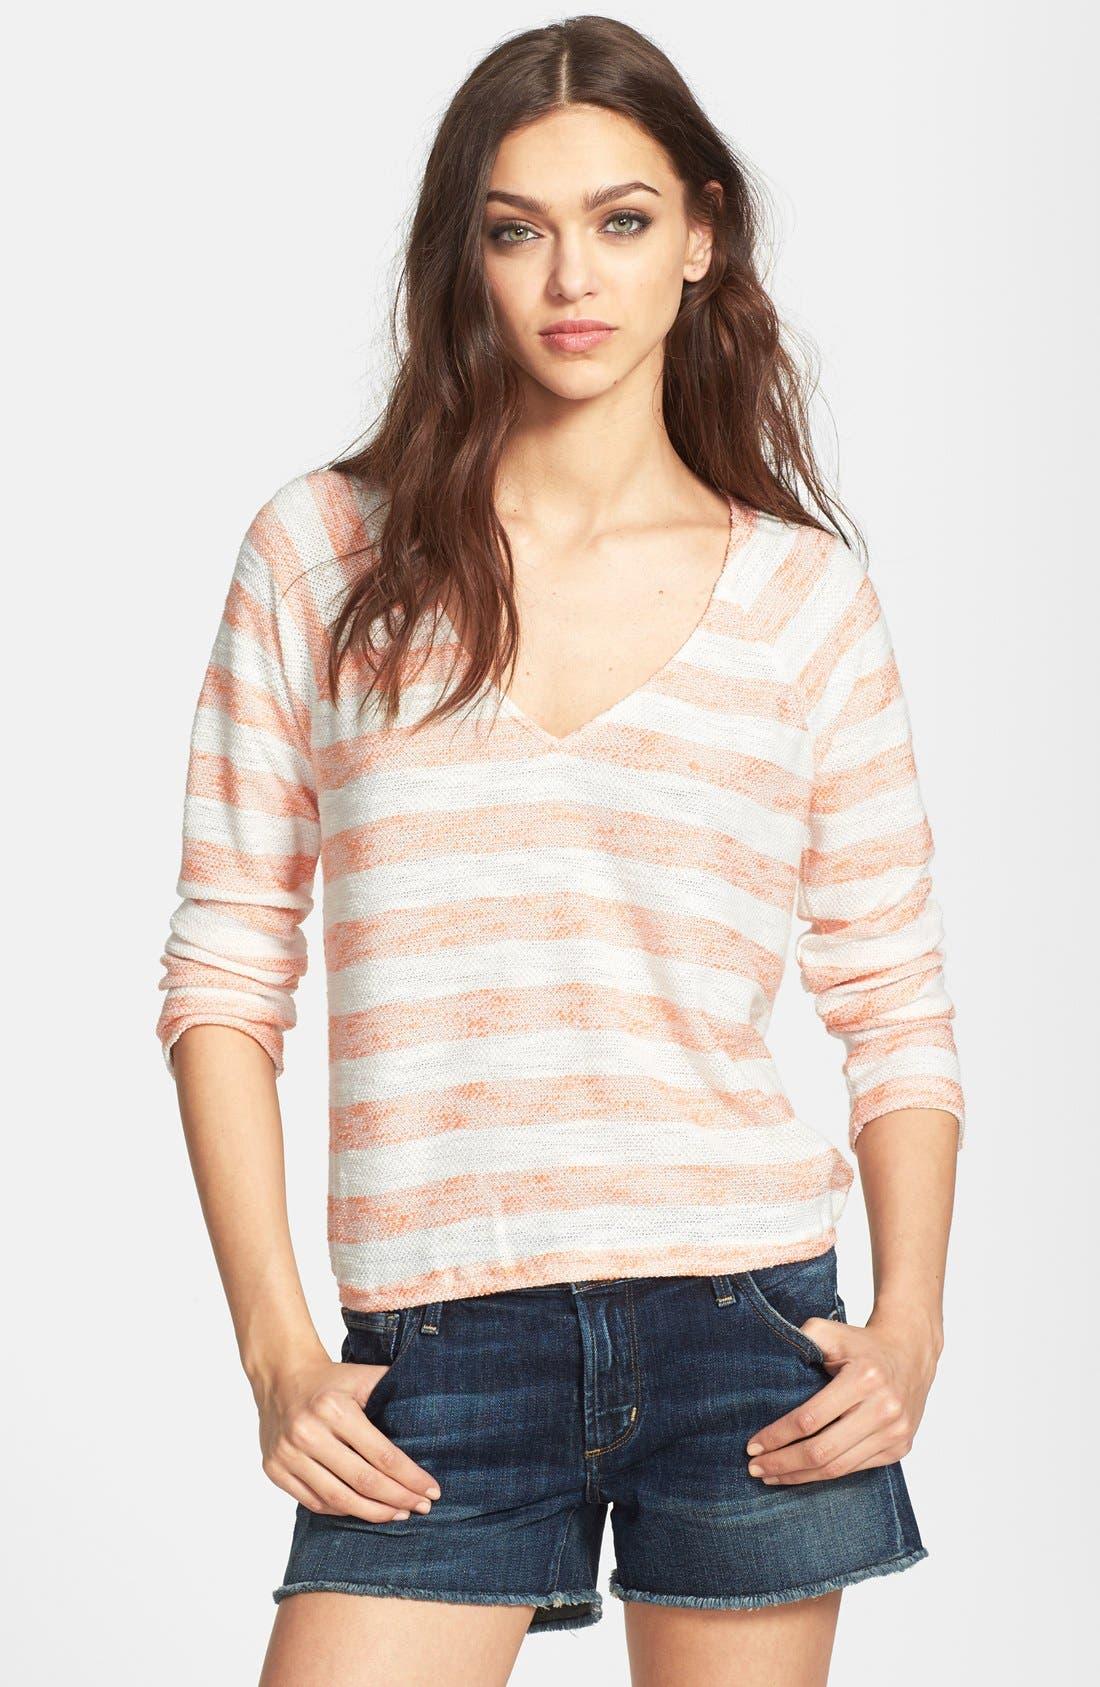 SANCTUARY 'Beach' V-Neck Knit Sweater, Main, color, 832